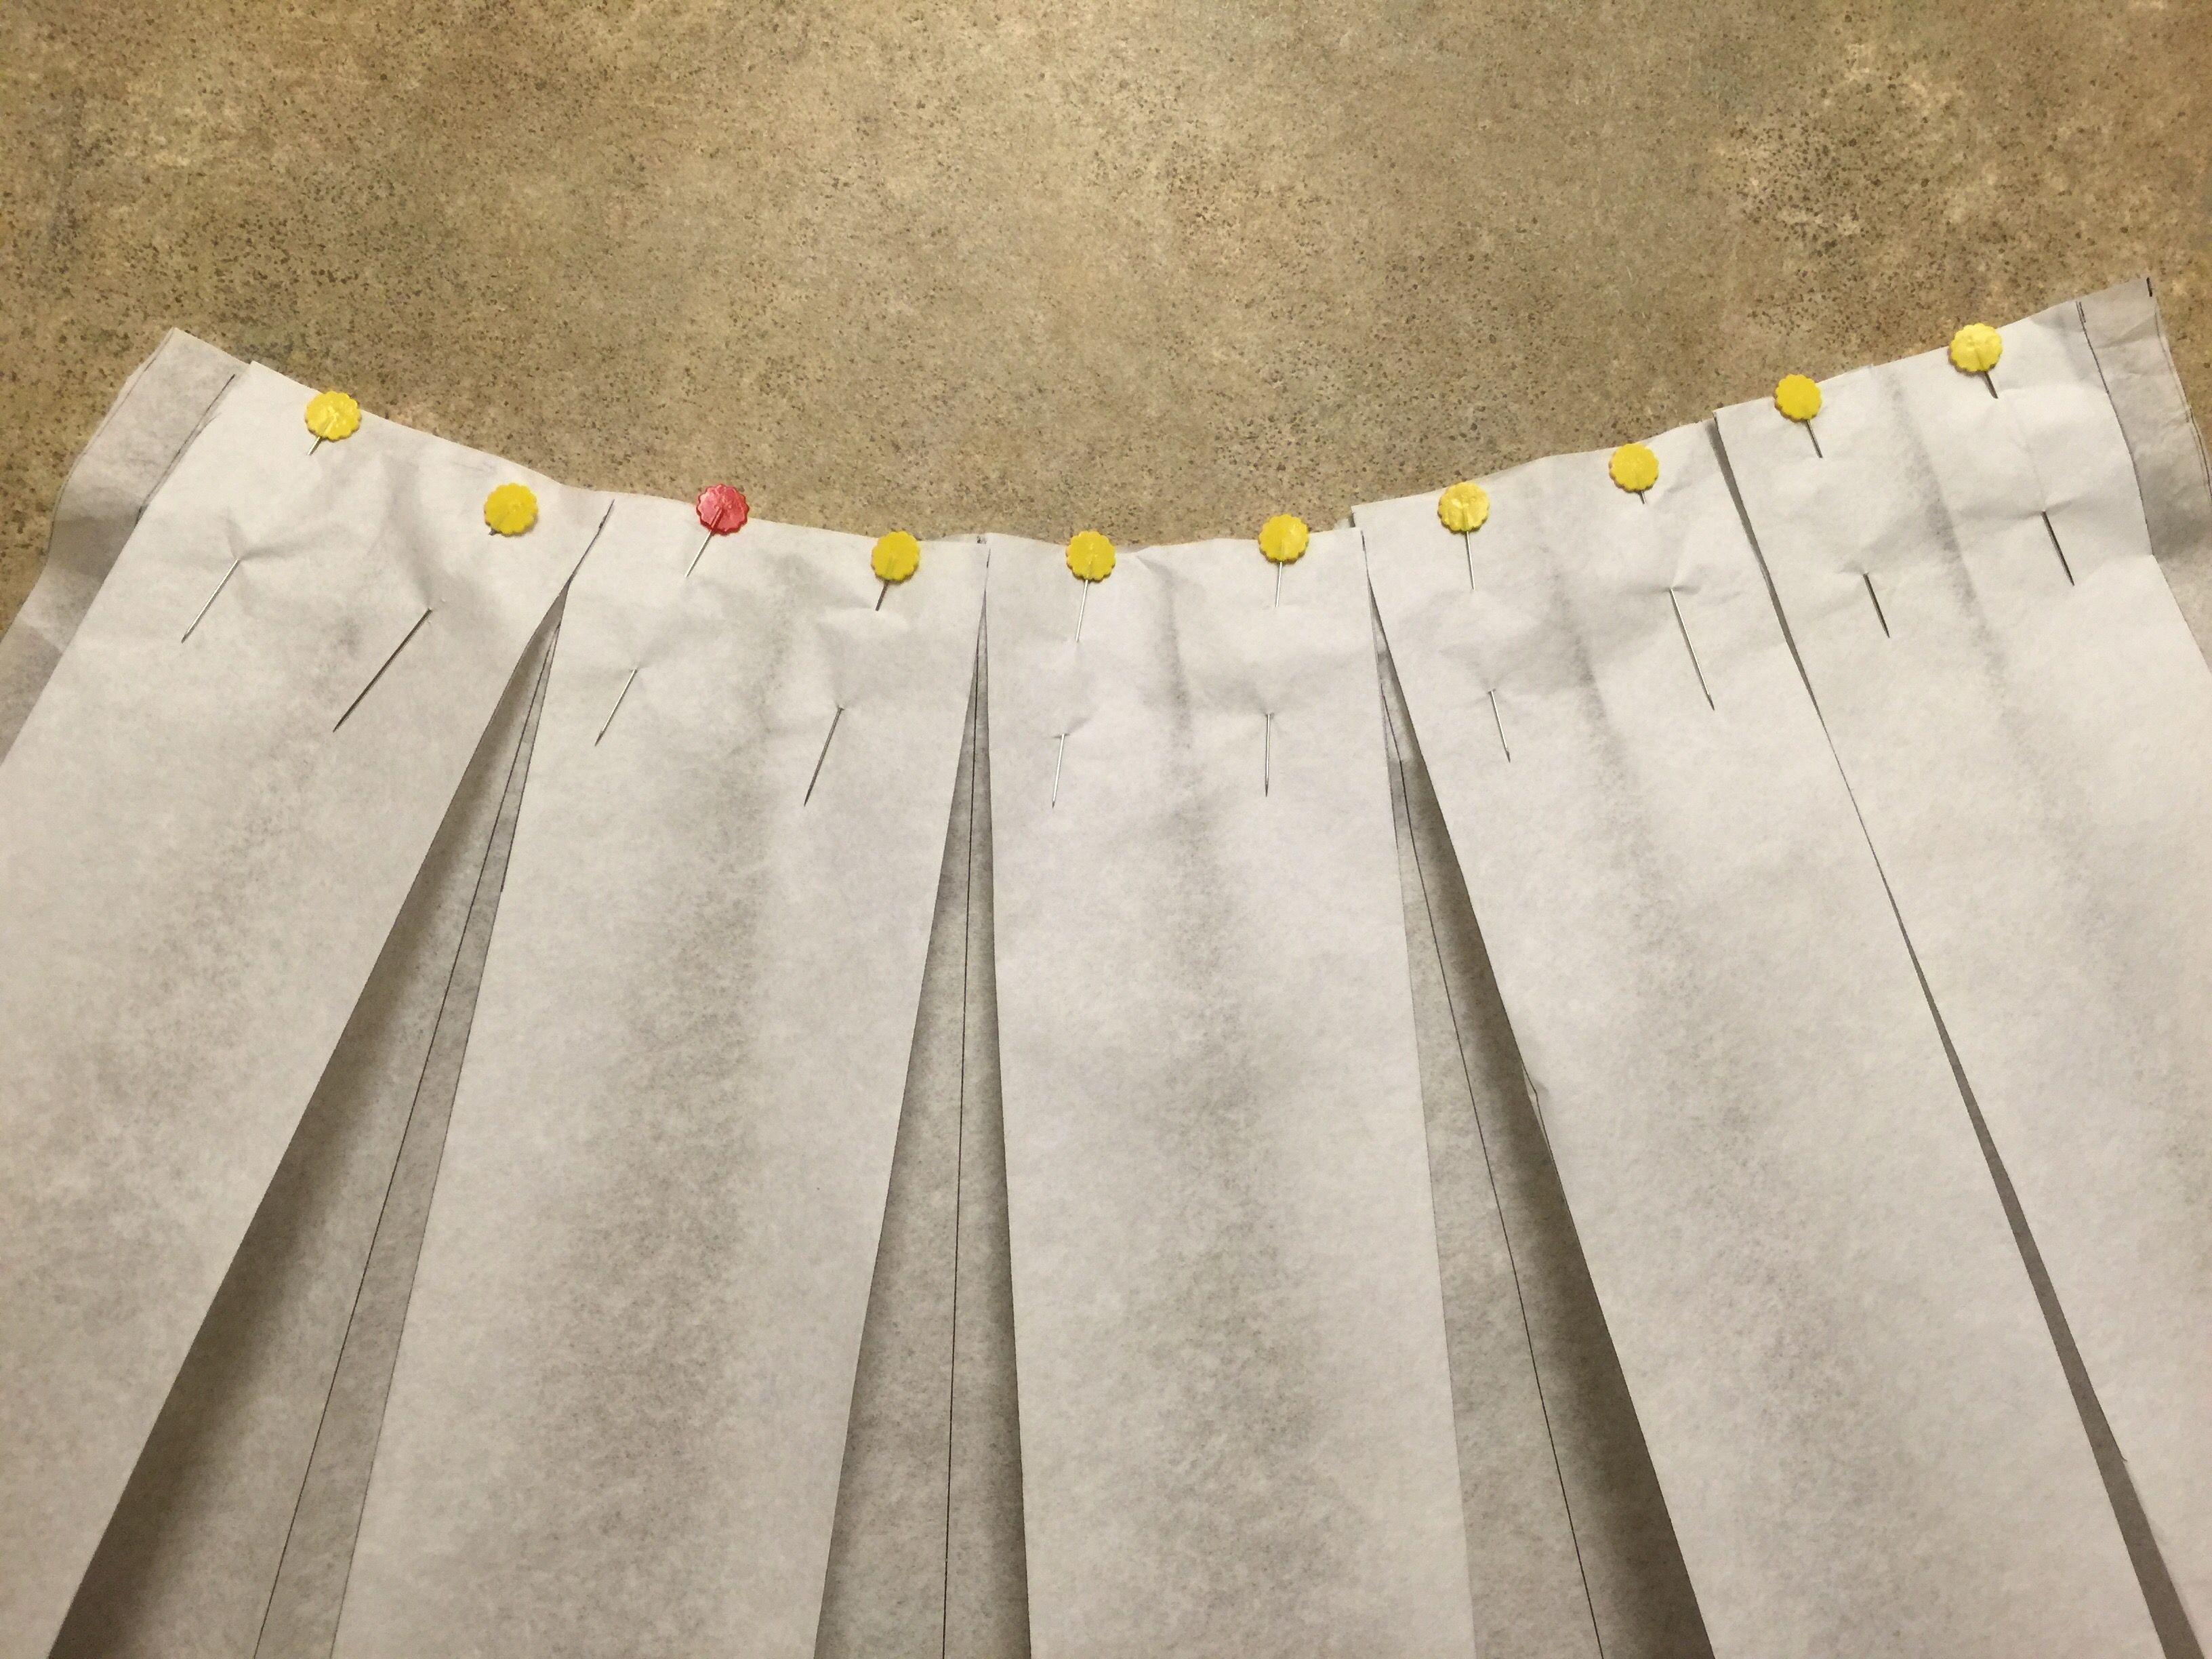 Diy: box pleated skirt tutorial youtube.